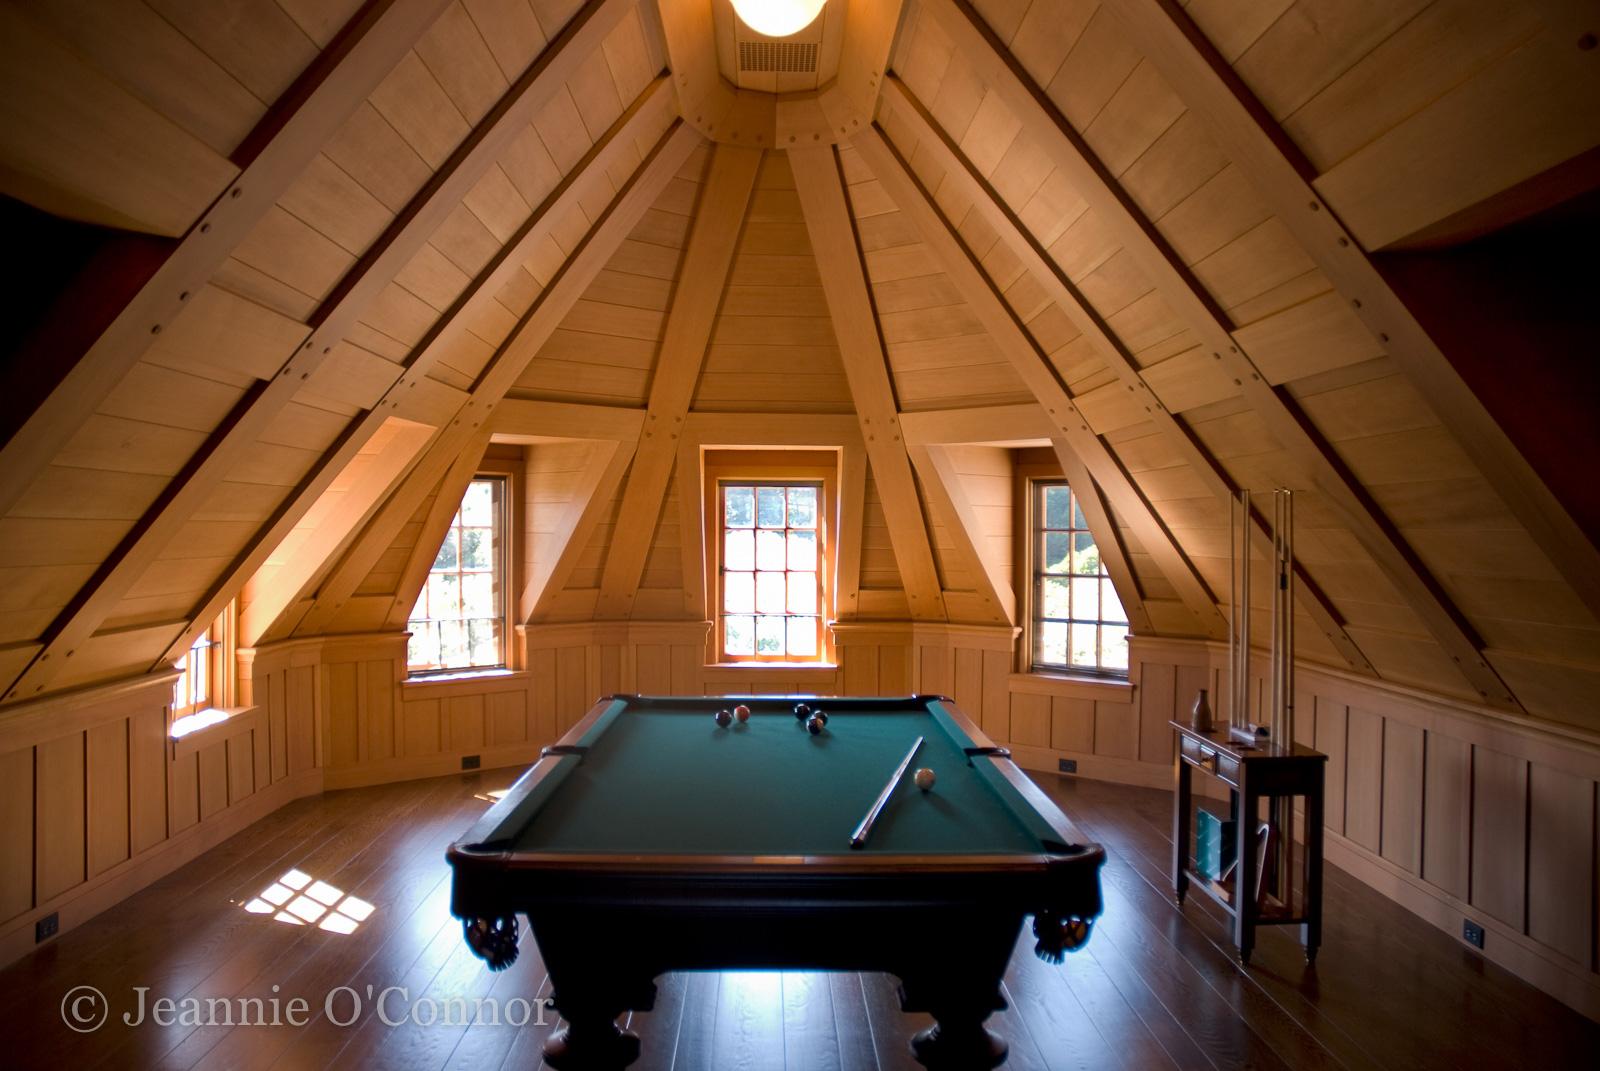 Piedmont_pool_table-2-2.jpg